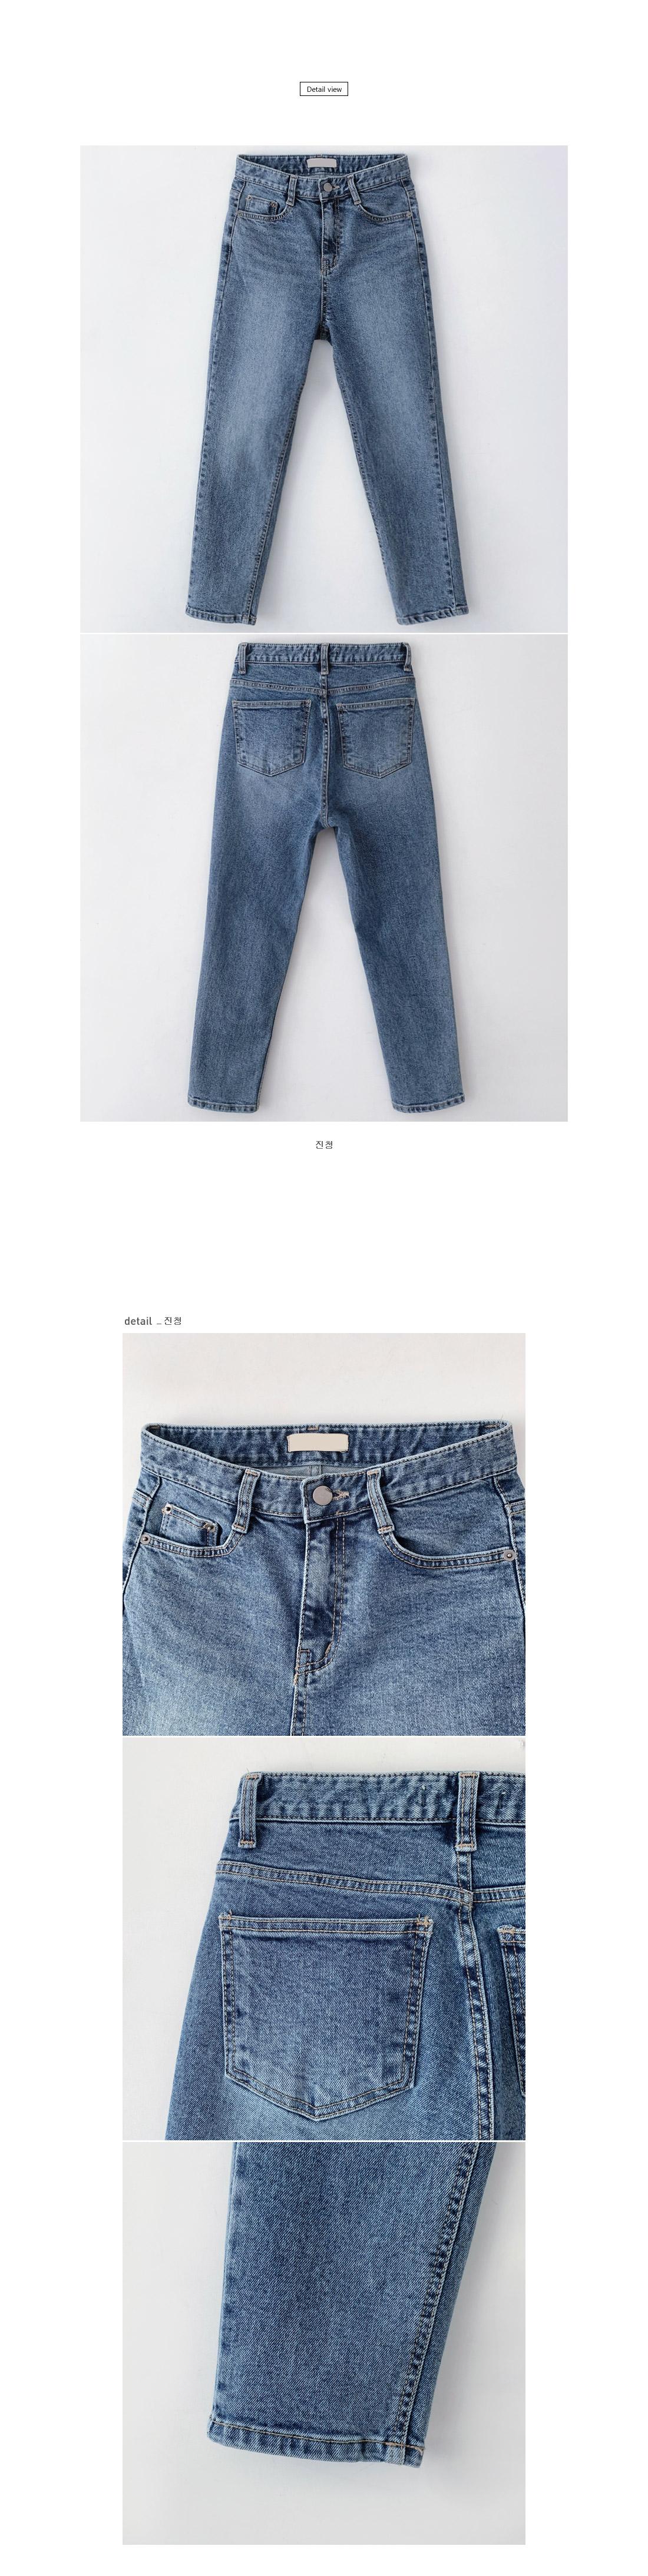 Troy Slim Baggy Denim Pants-S,L Size